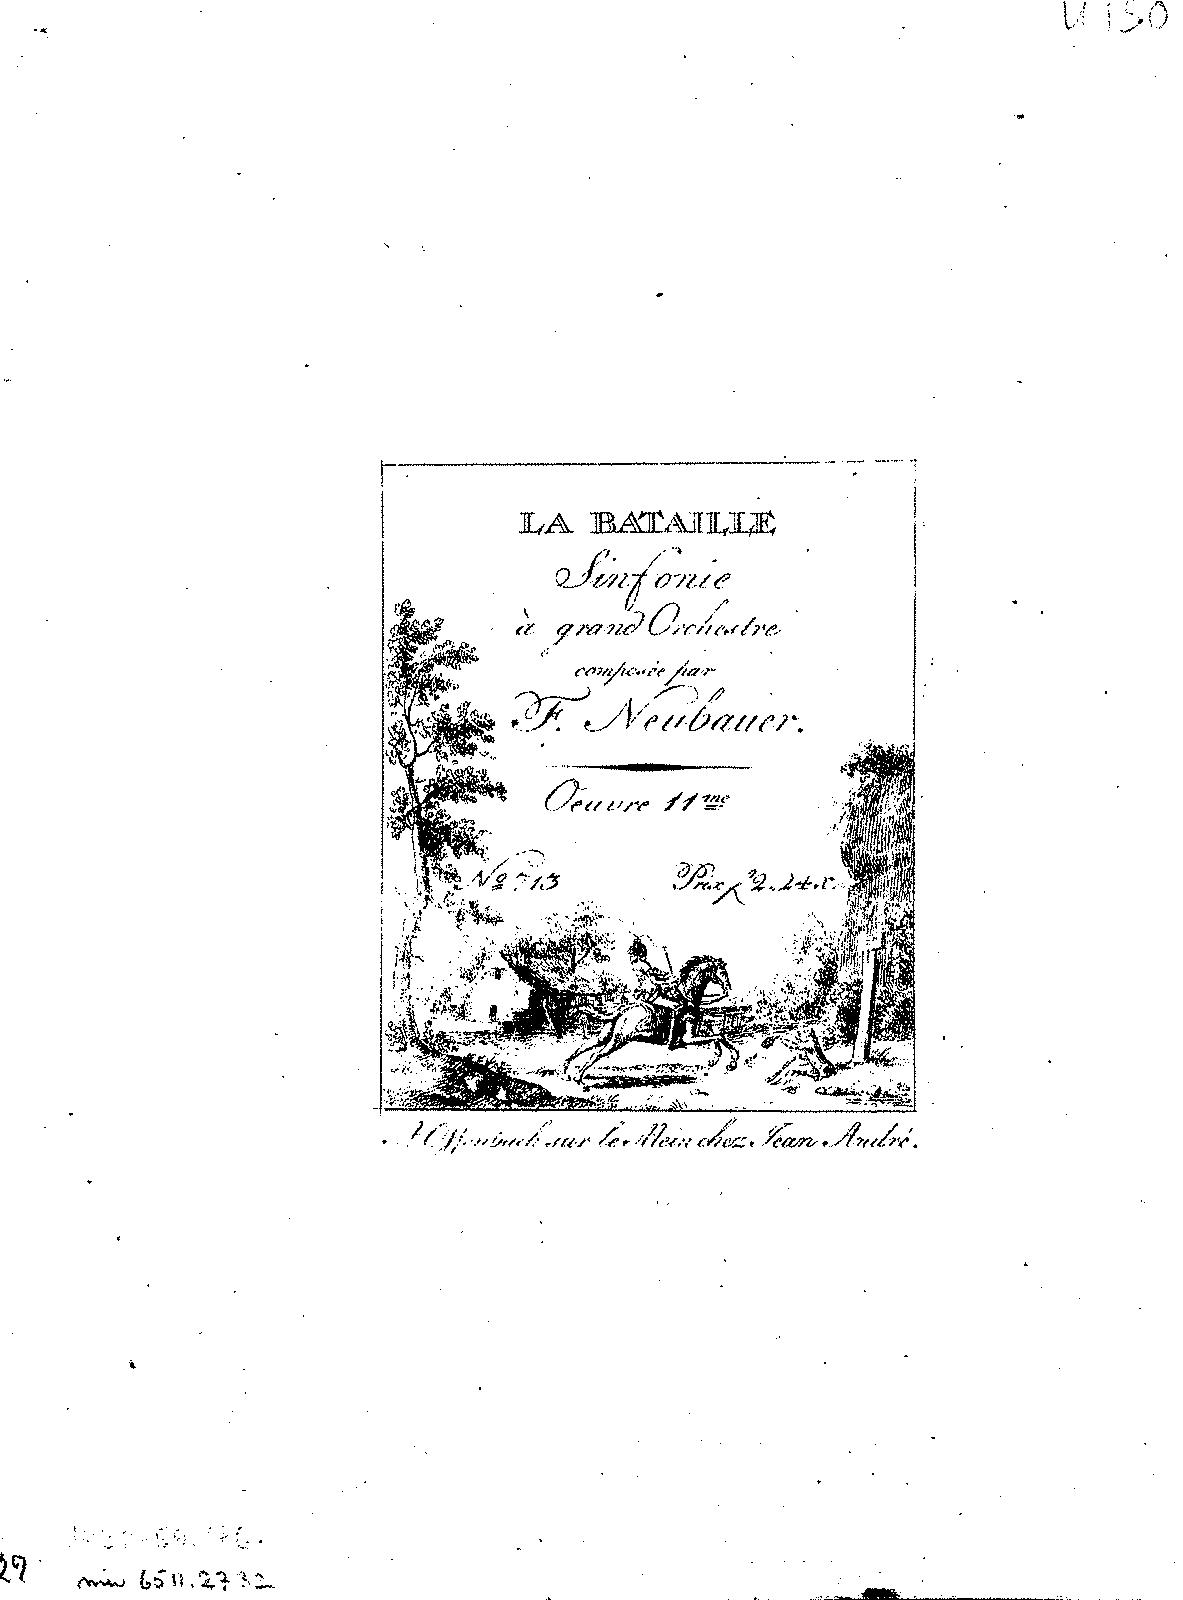 Symphony 'La Bataille', Op 11 (Neubauer, Franz Christoph